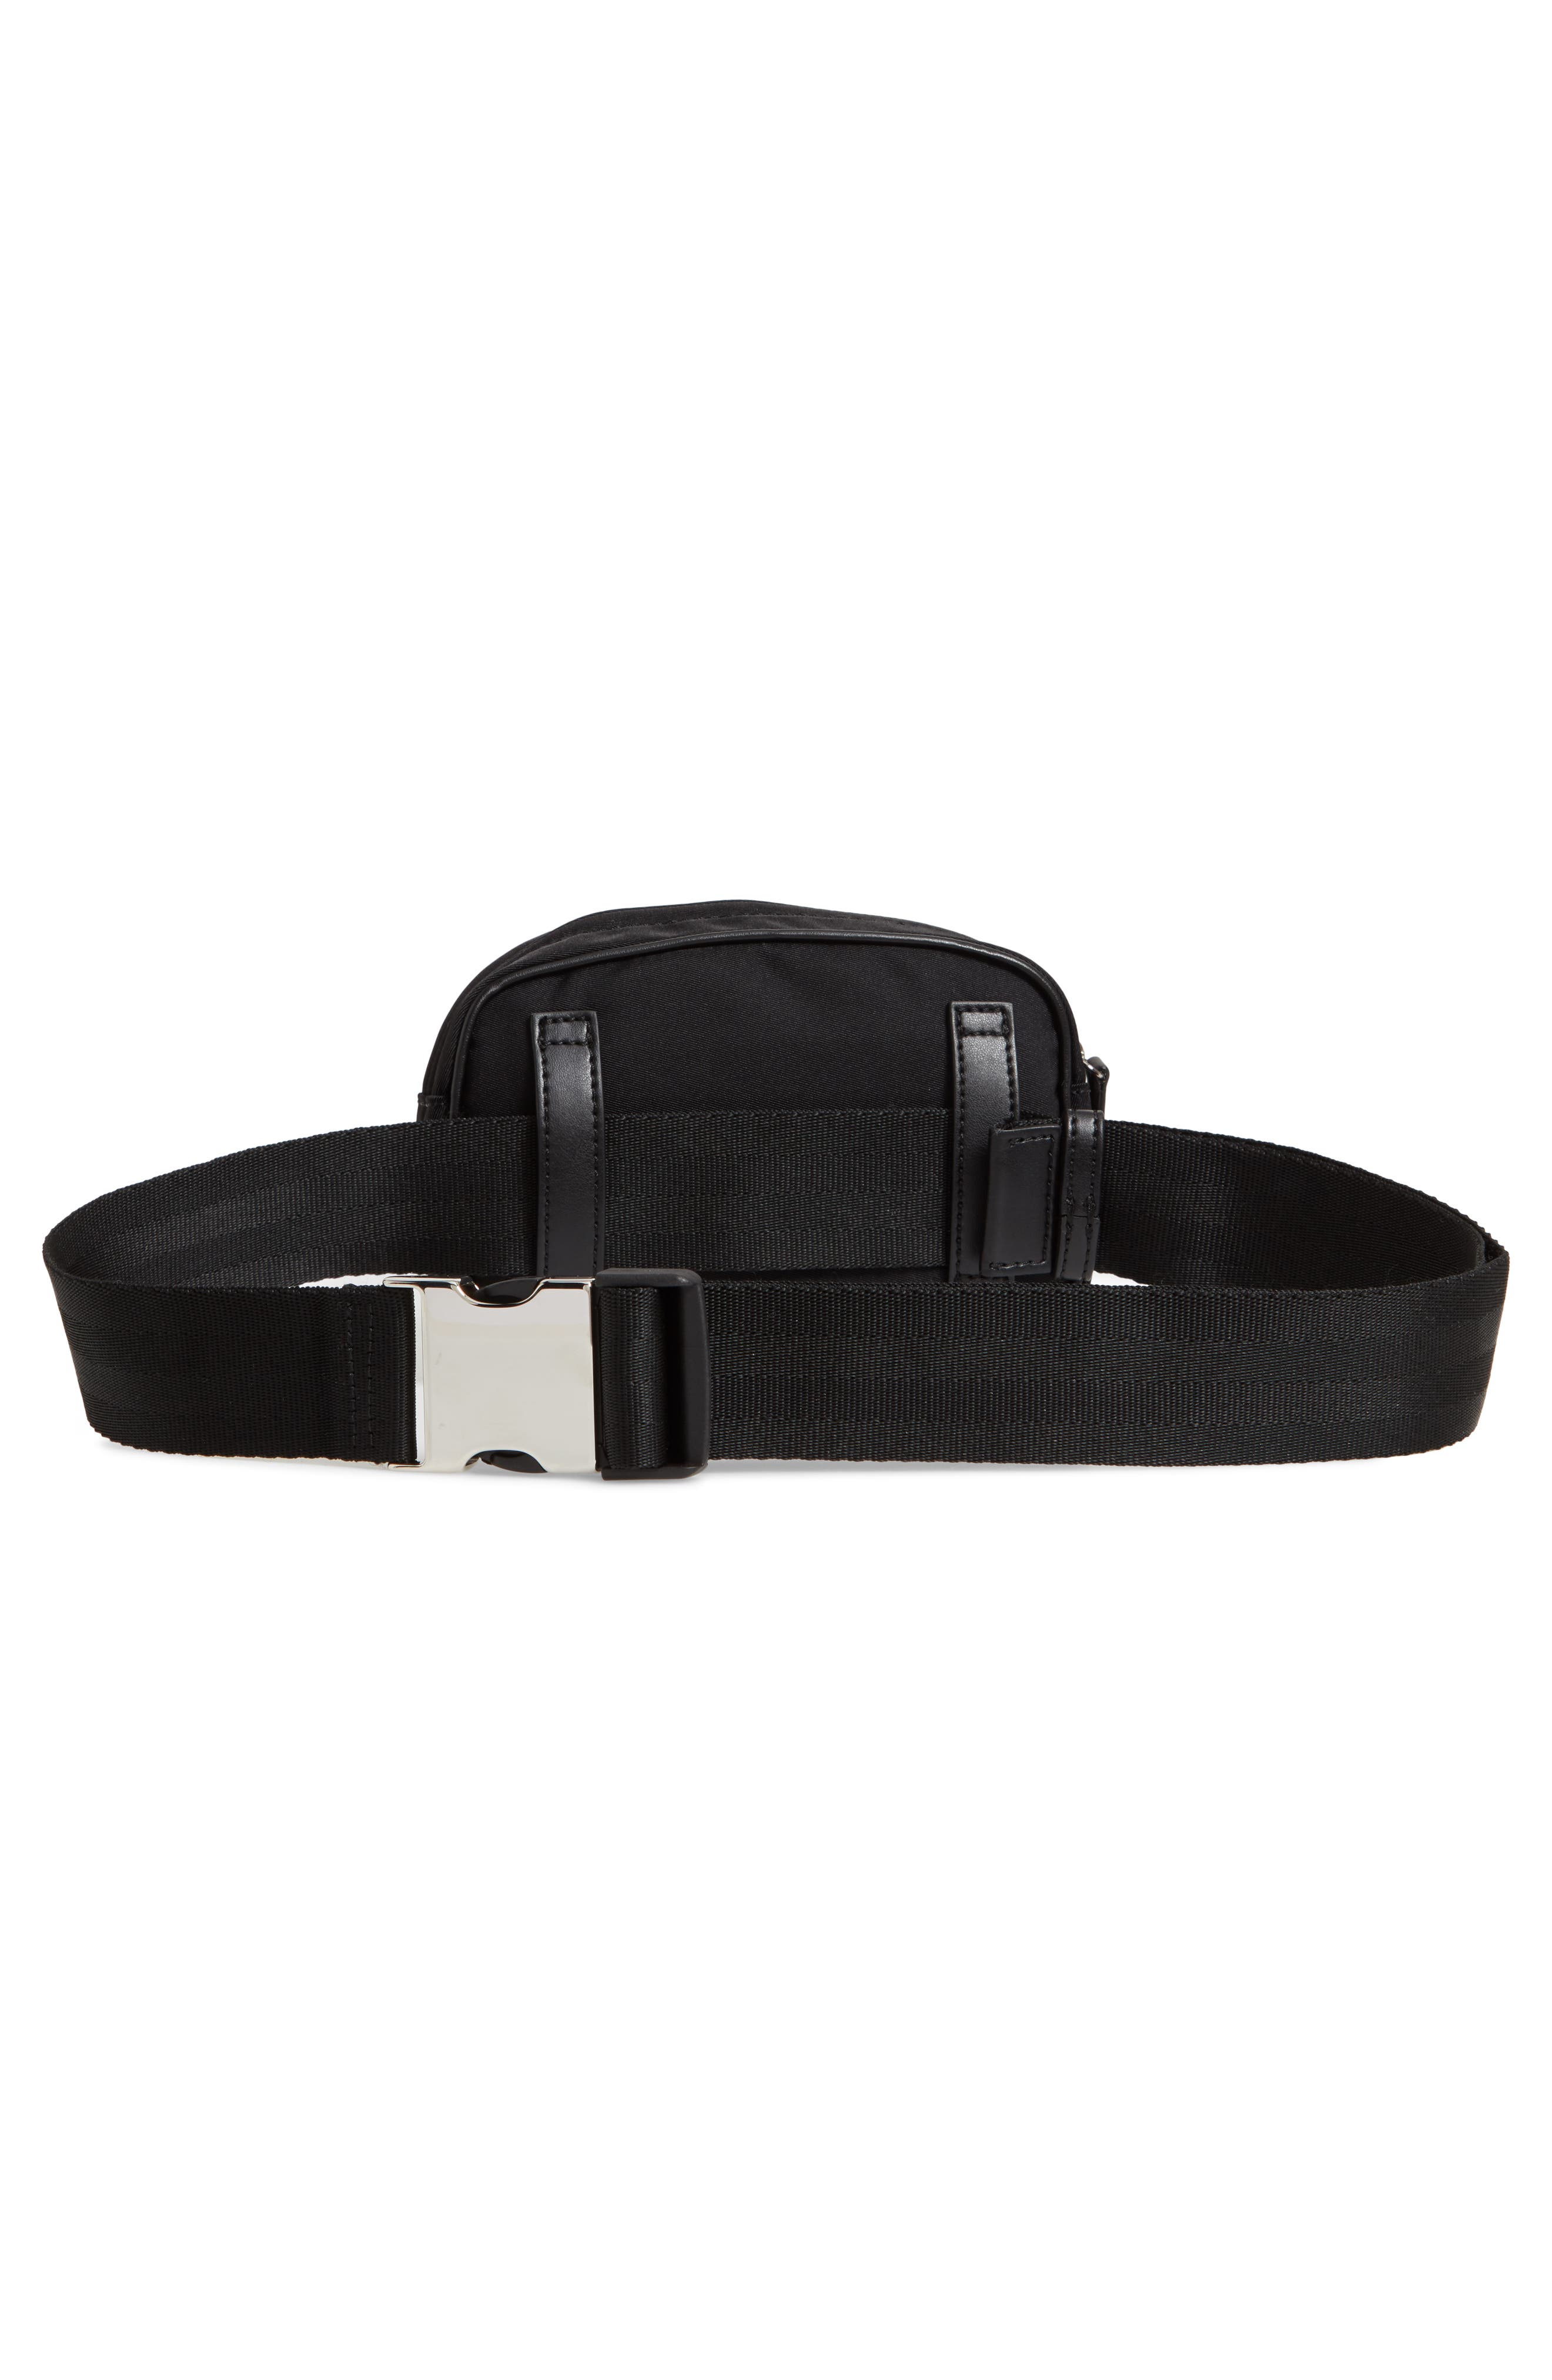 Nylon Convertible Belt Bag,                             Alternate thumbnail 4, color,                             BLACK/ SILVER